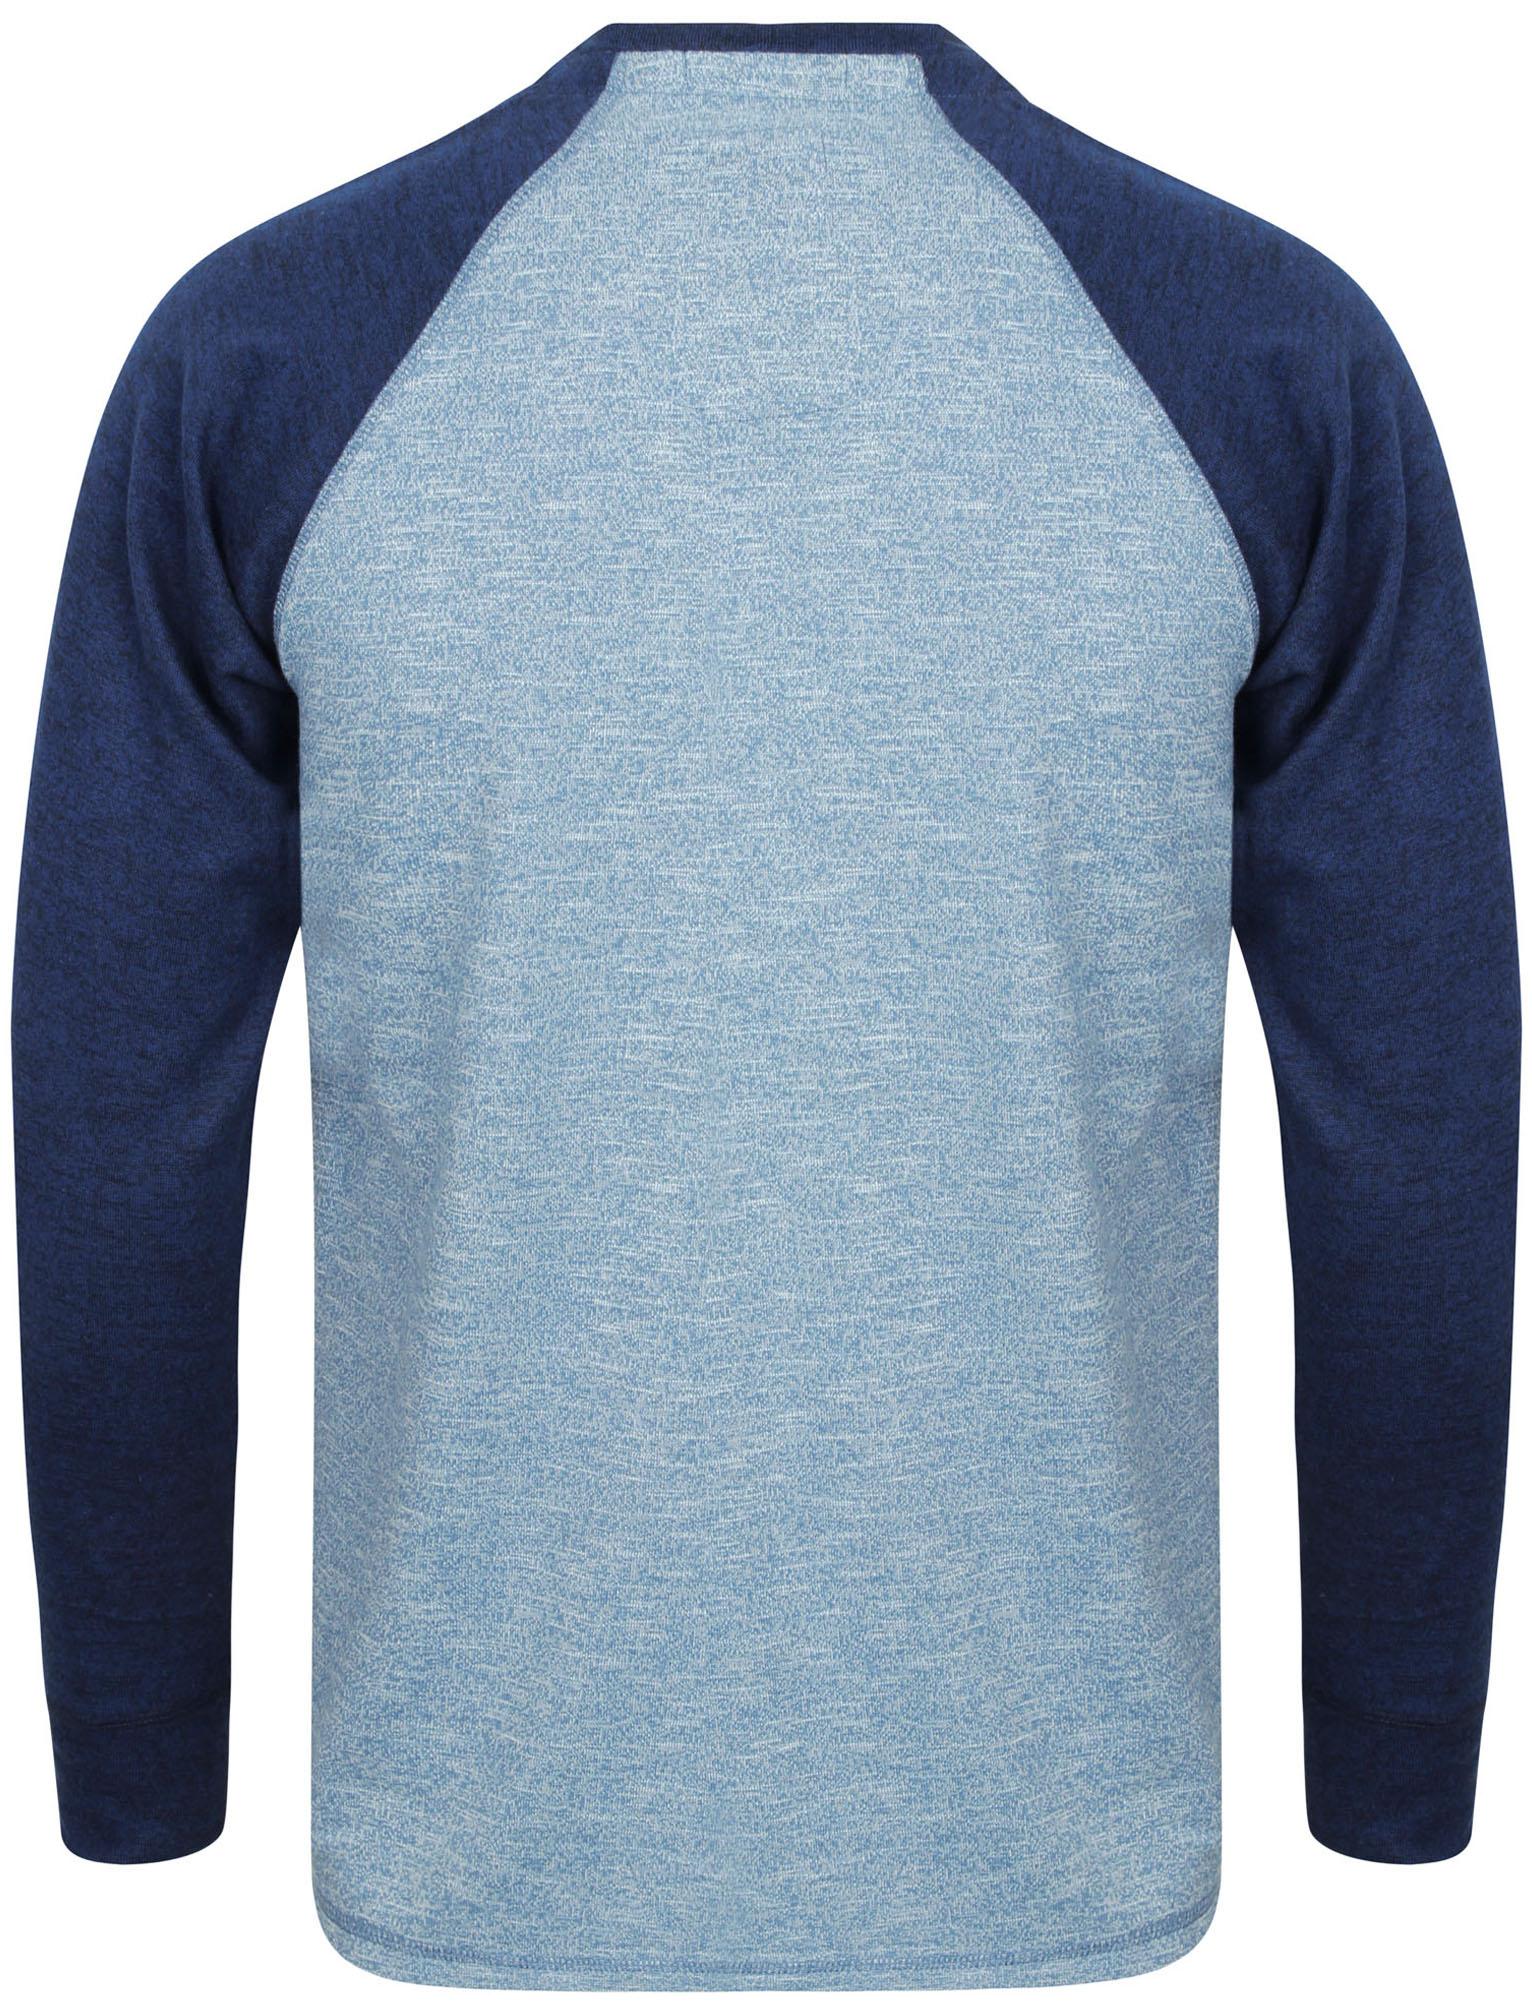 New-Tokyo-Laundry-Mens-Crew-Neck-Cotton-Blend-Long-Contrast-Sleeve-Top-Size-S-XL thumbnail 5